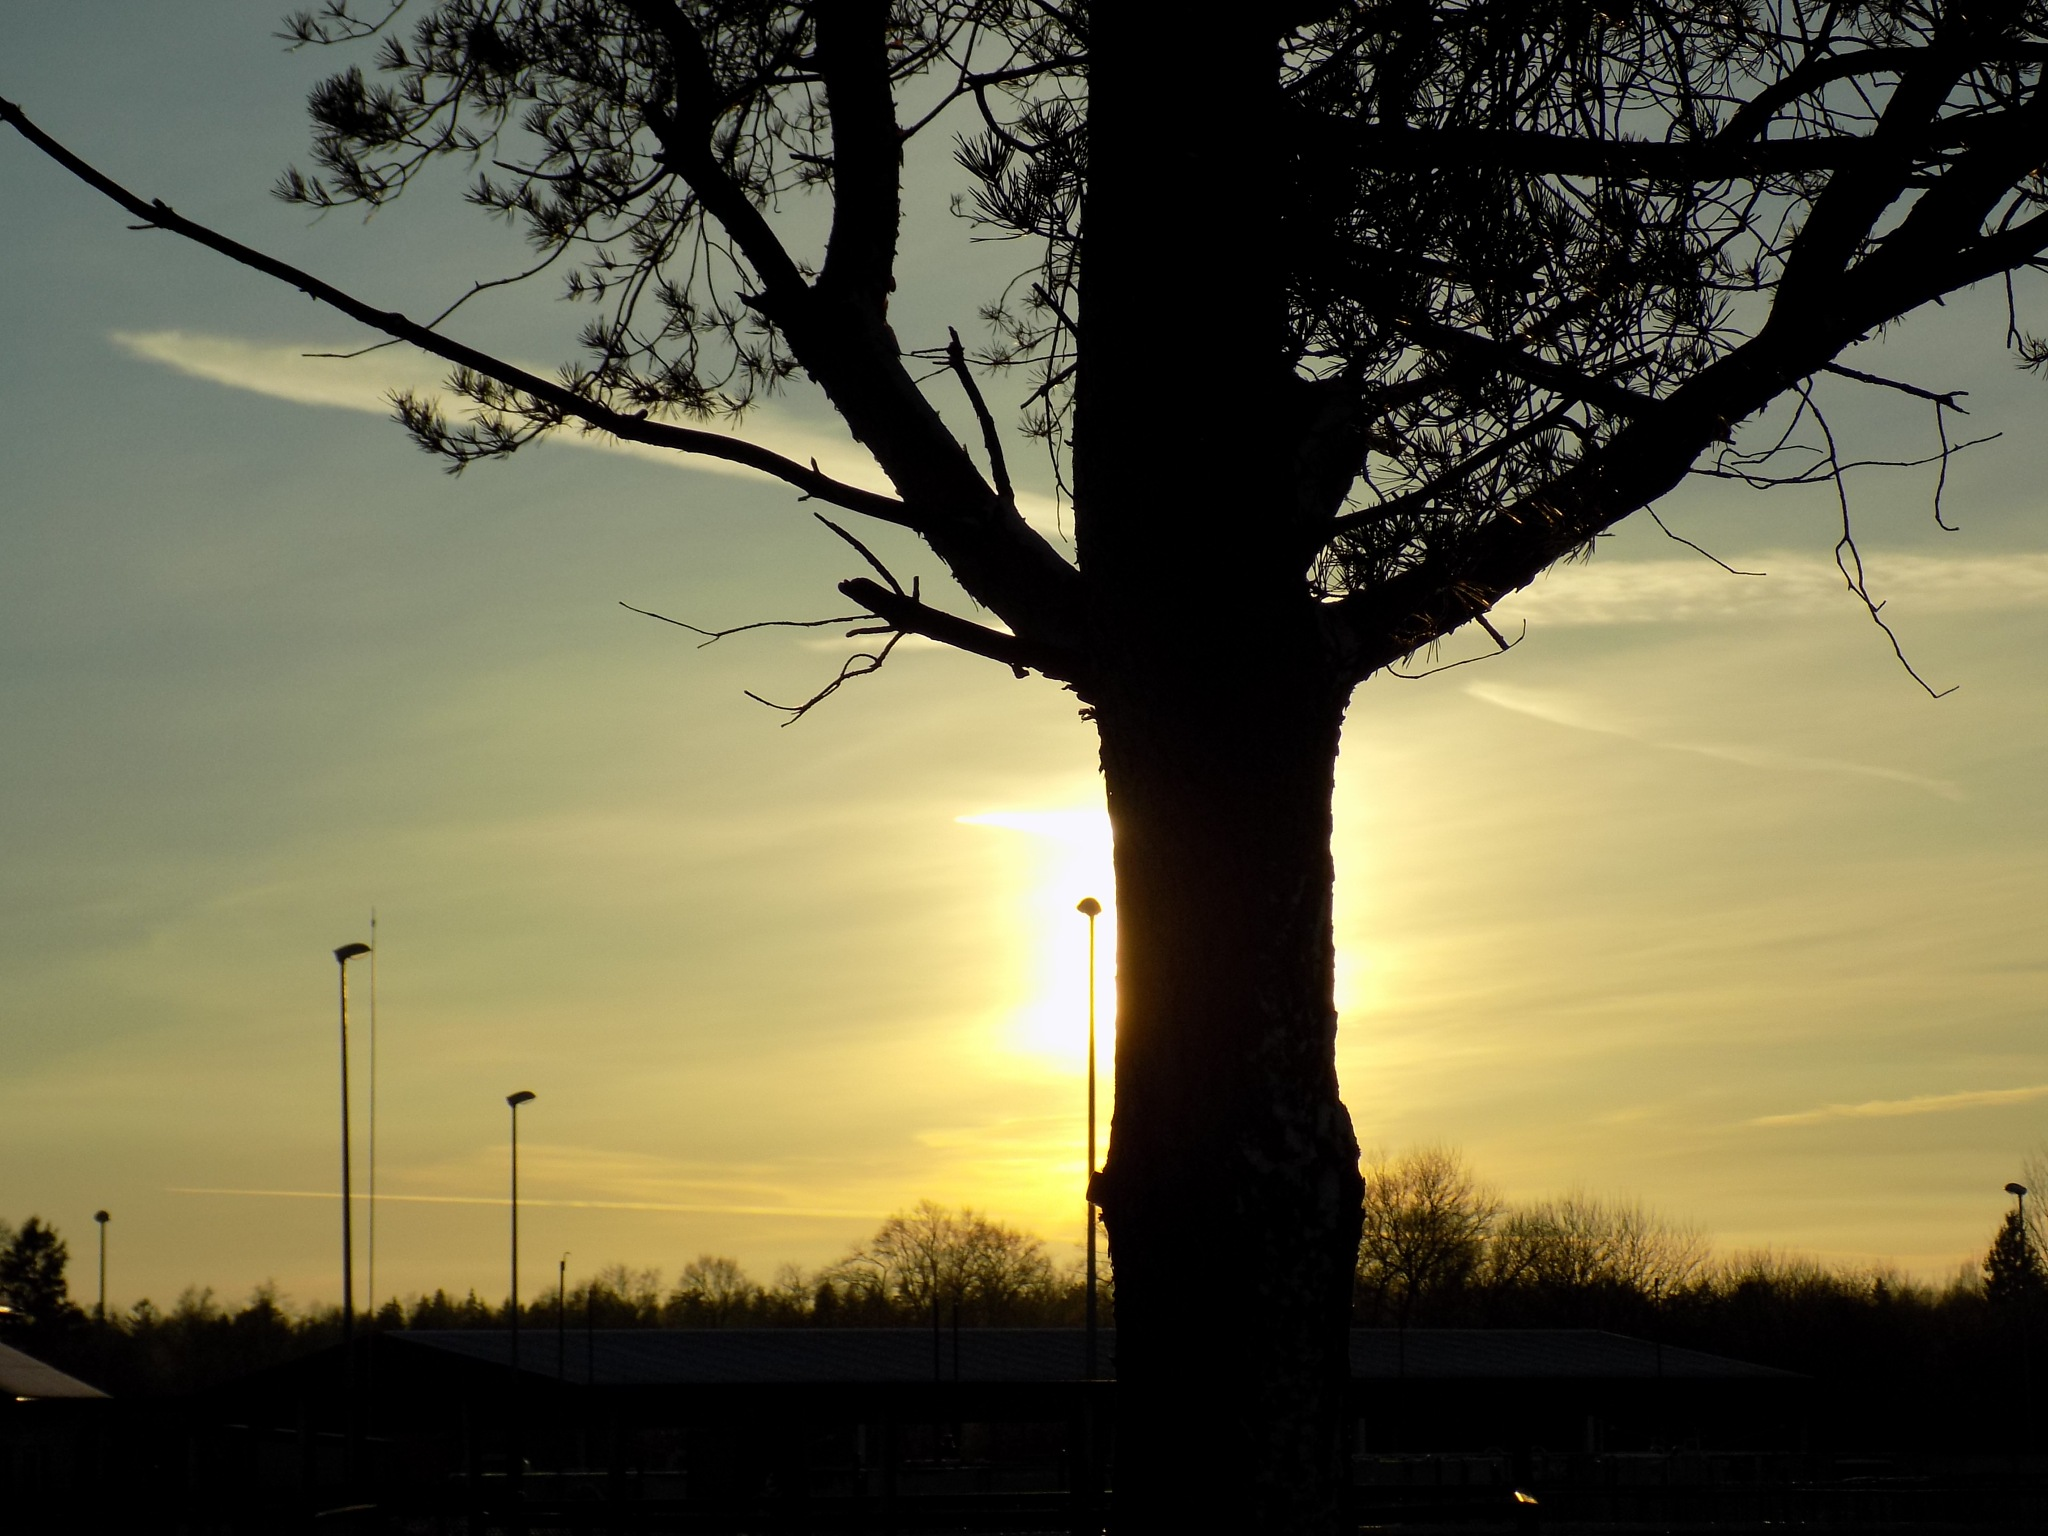 Tree by uzkuraitiene62